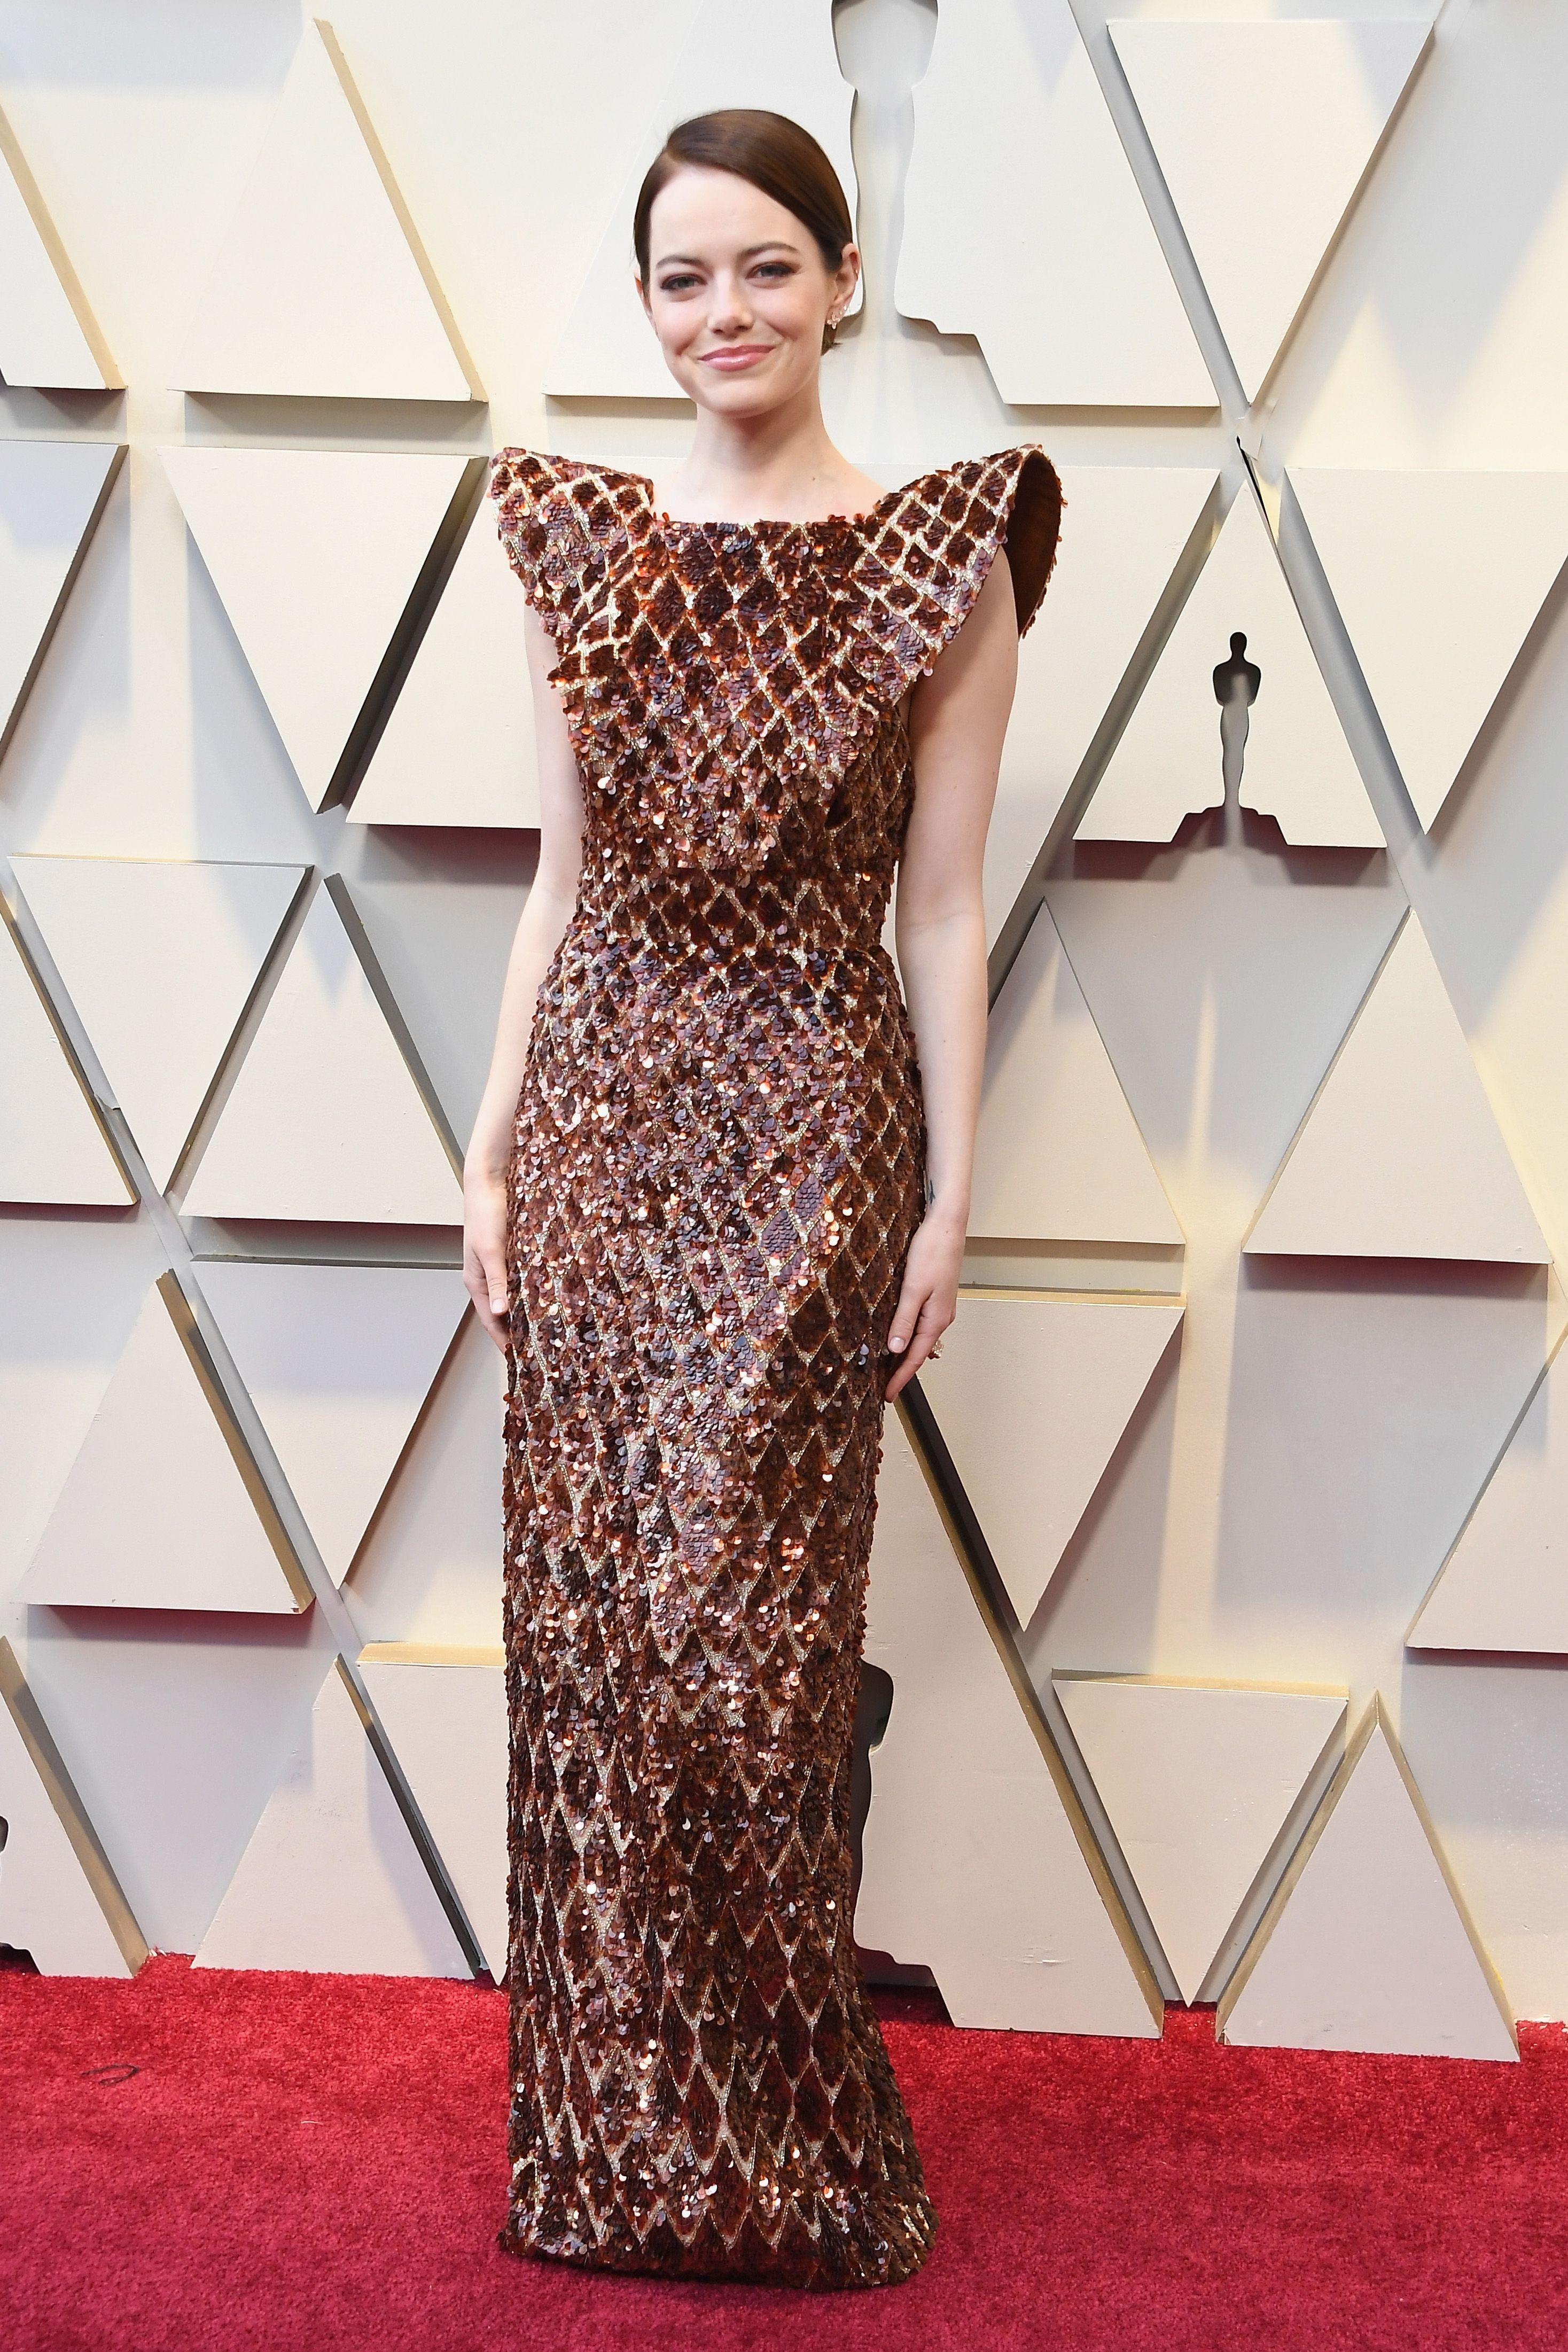 91st Annual Academy Awards - Arrivals - Emma Stone